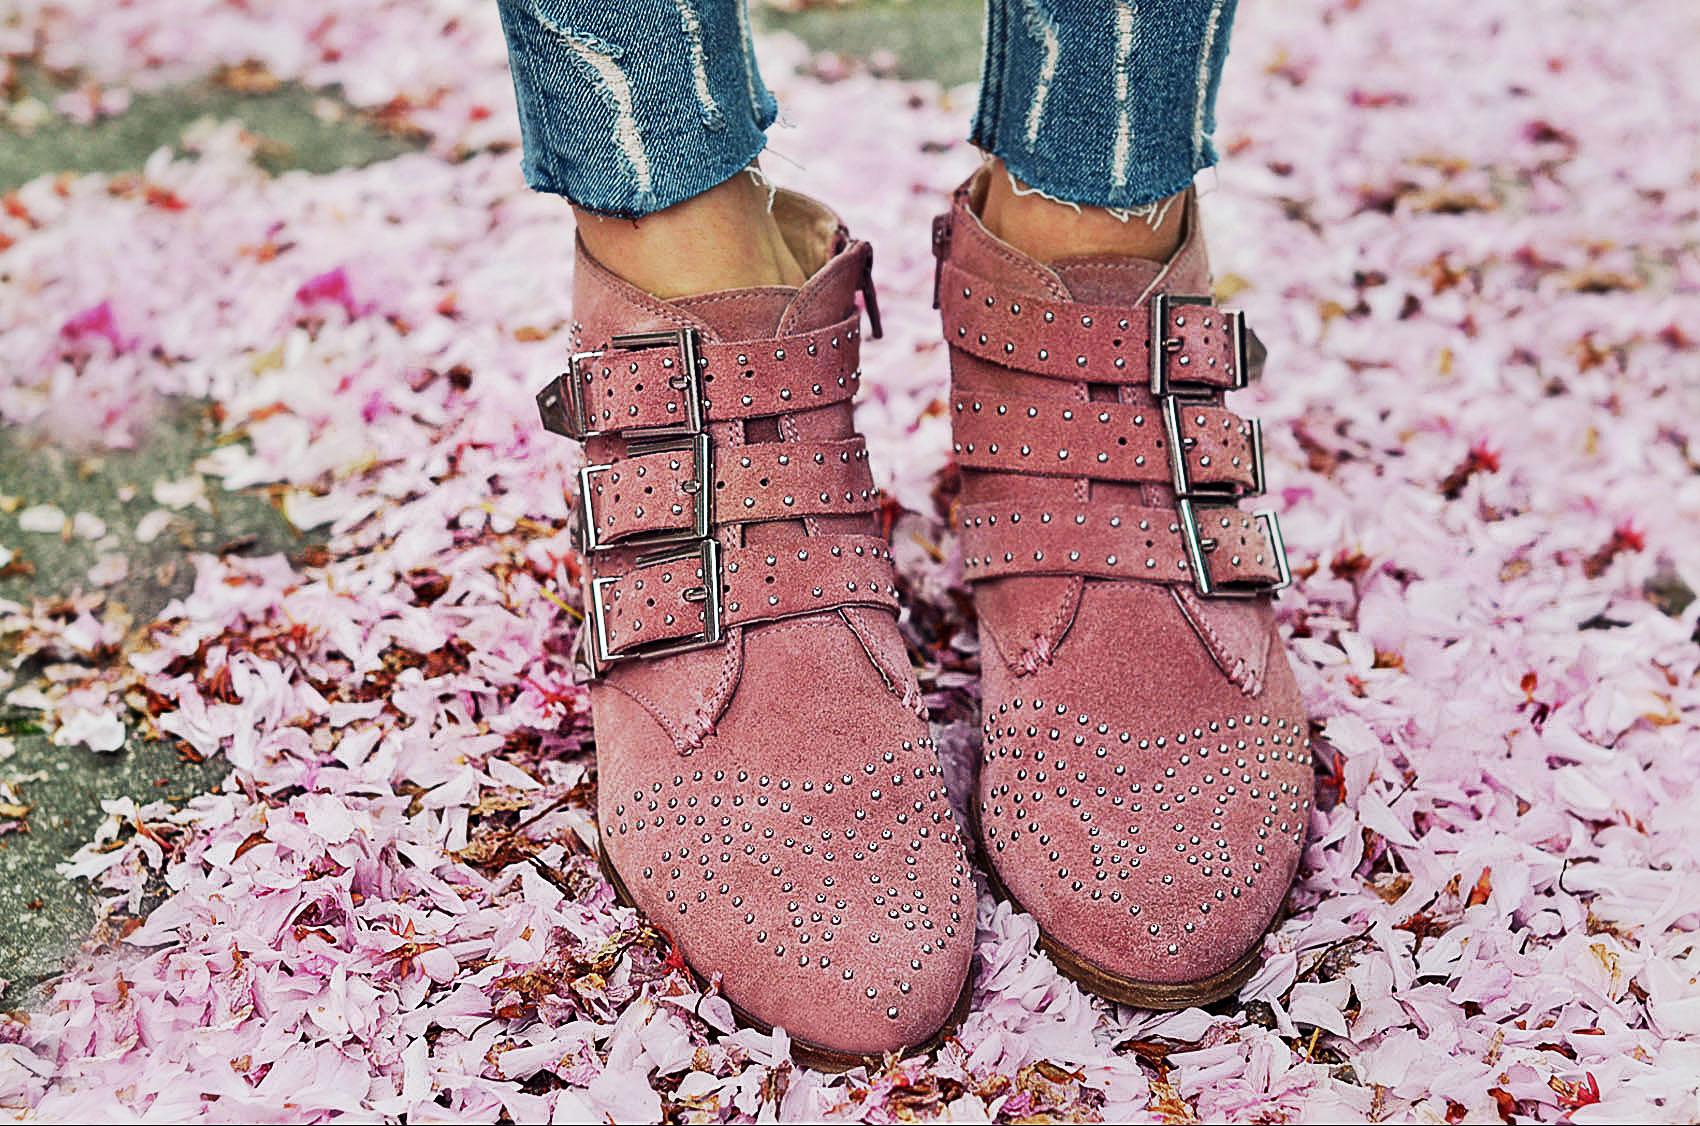 schuhe, boots, ankleboots, nieten, denim, jeans, shoes, shopping, trend, rosa, pink